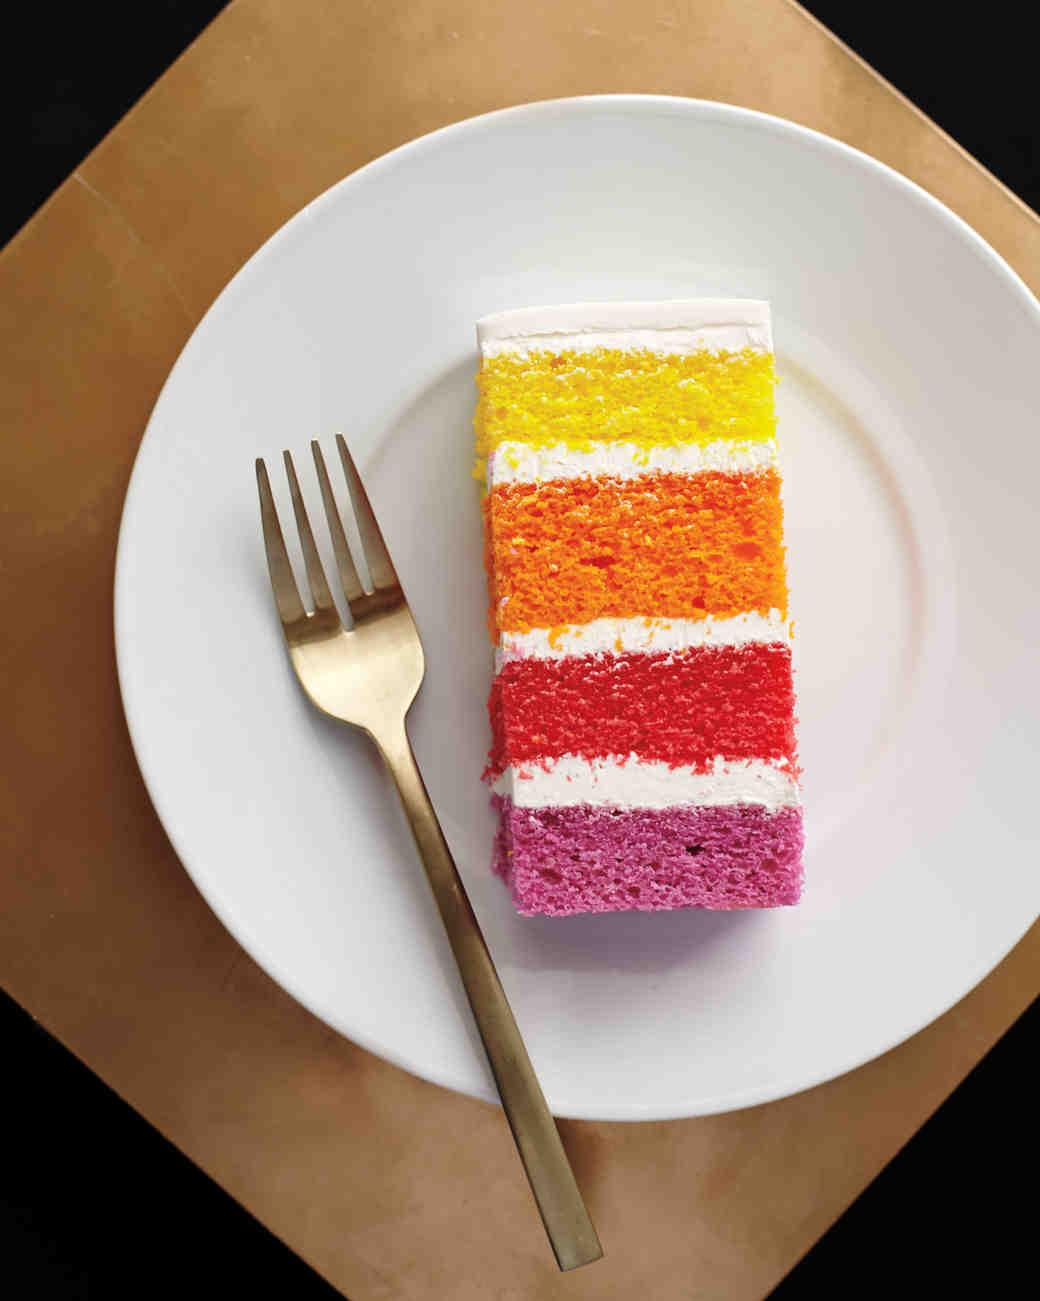 hanna-bret-cake-reception-details-015-s111676.jpg